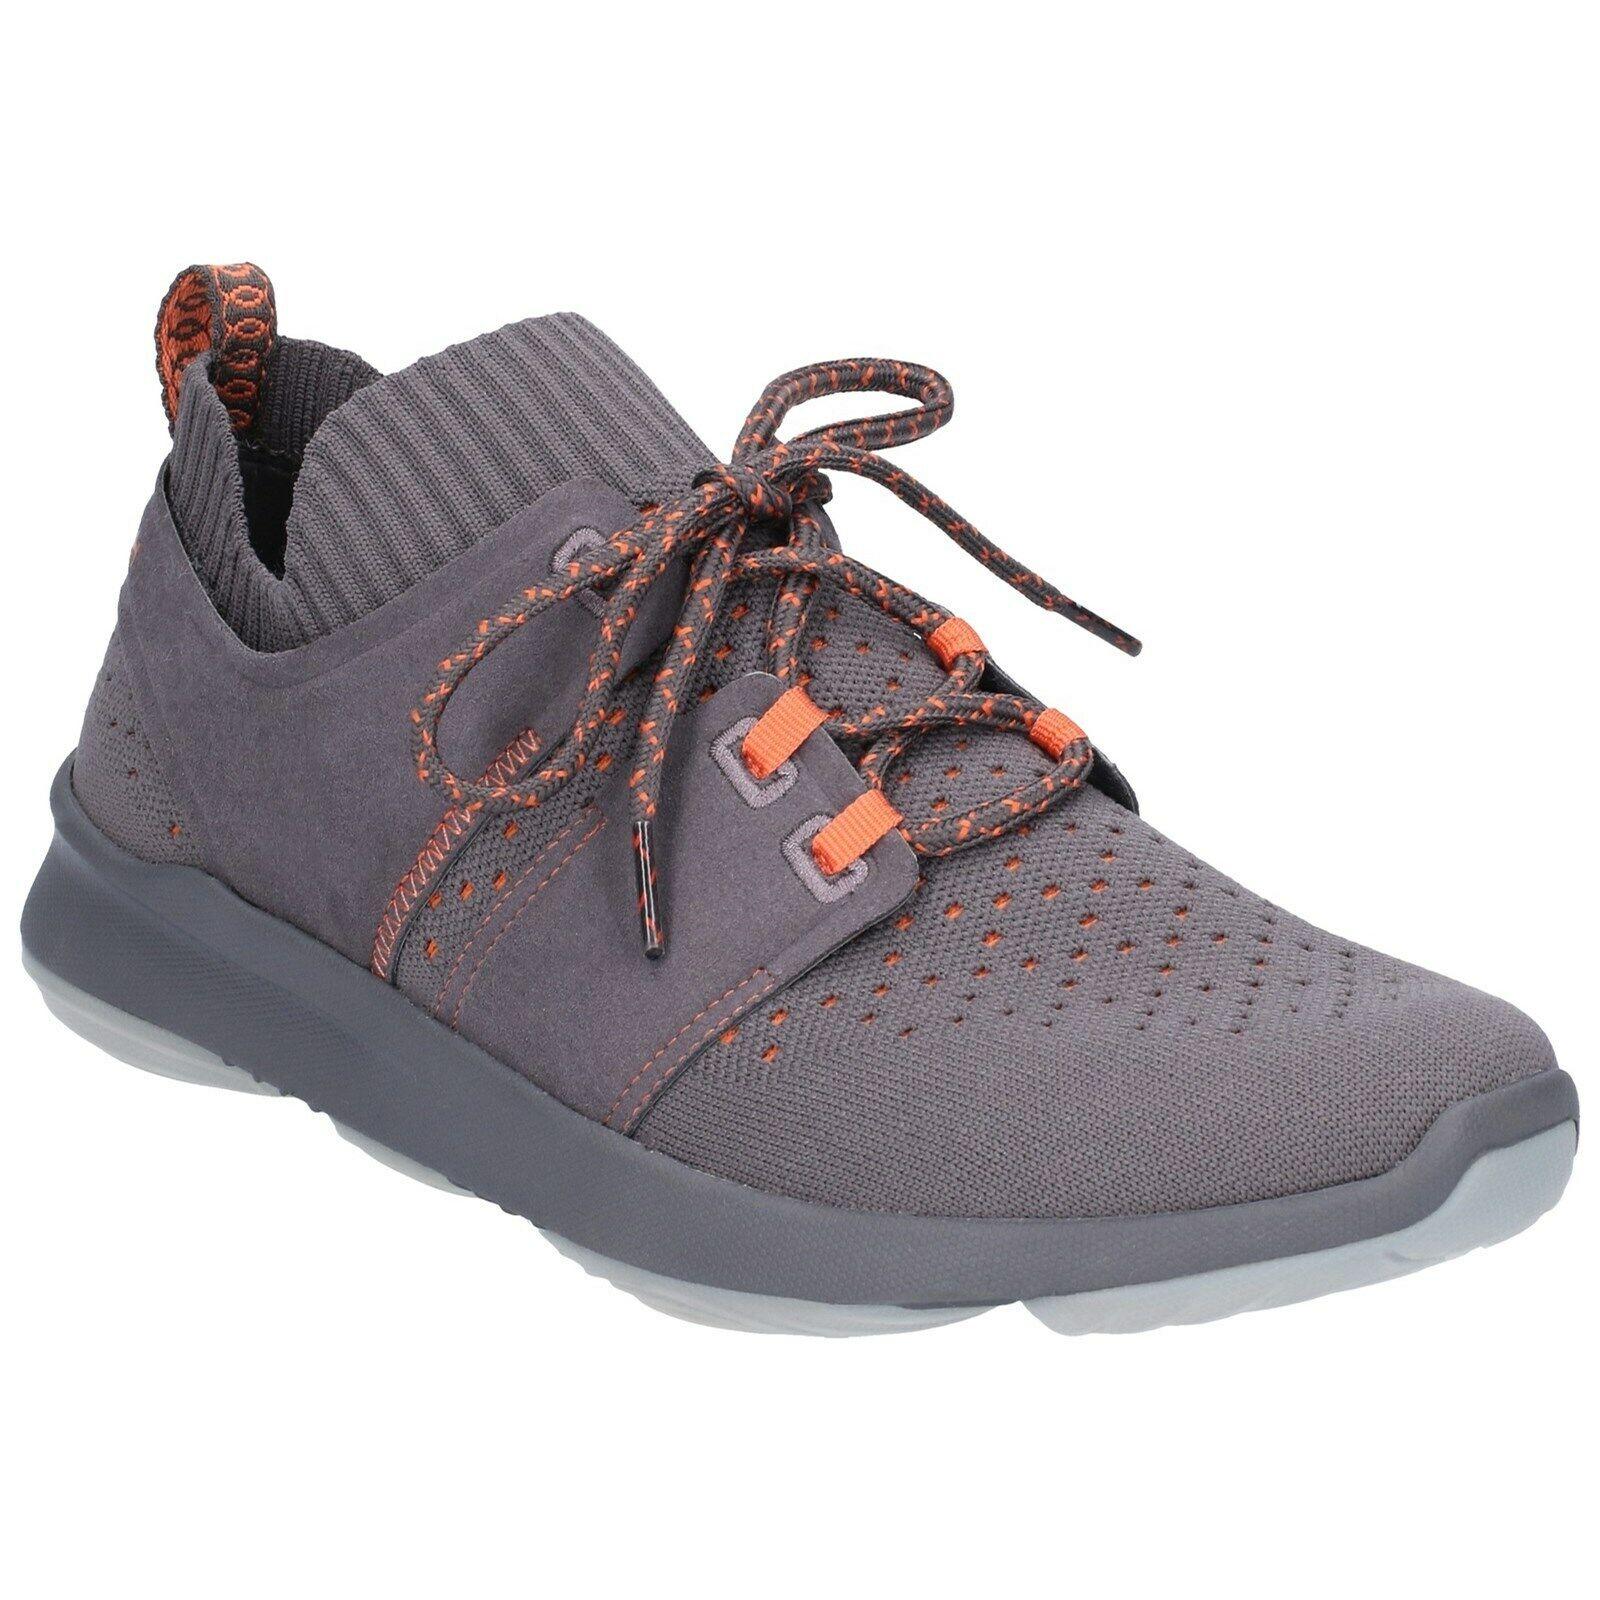 Zapatillas para hombre bouncemax Hush Puppies World Deportes biodewix Knit Tenis Zapatos